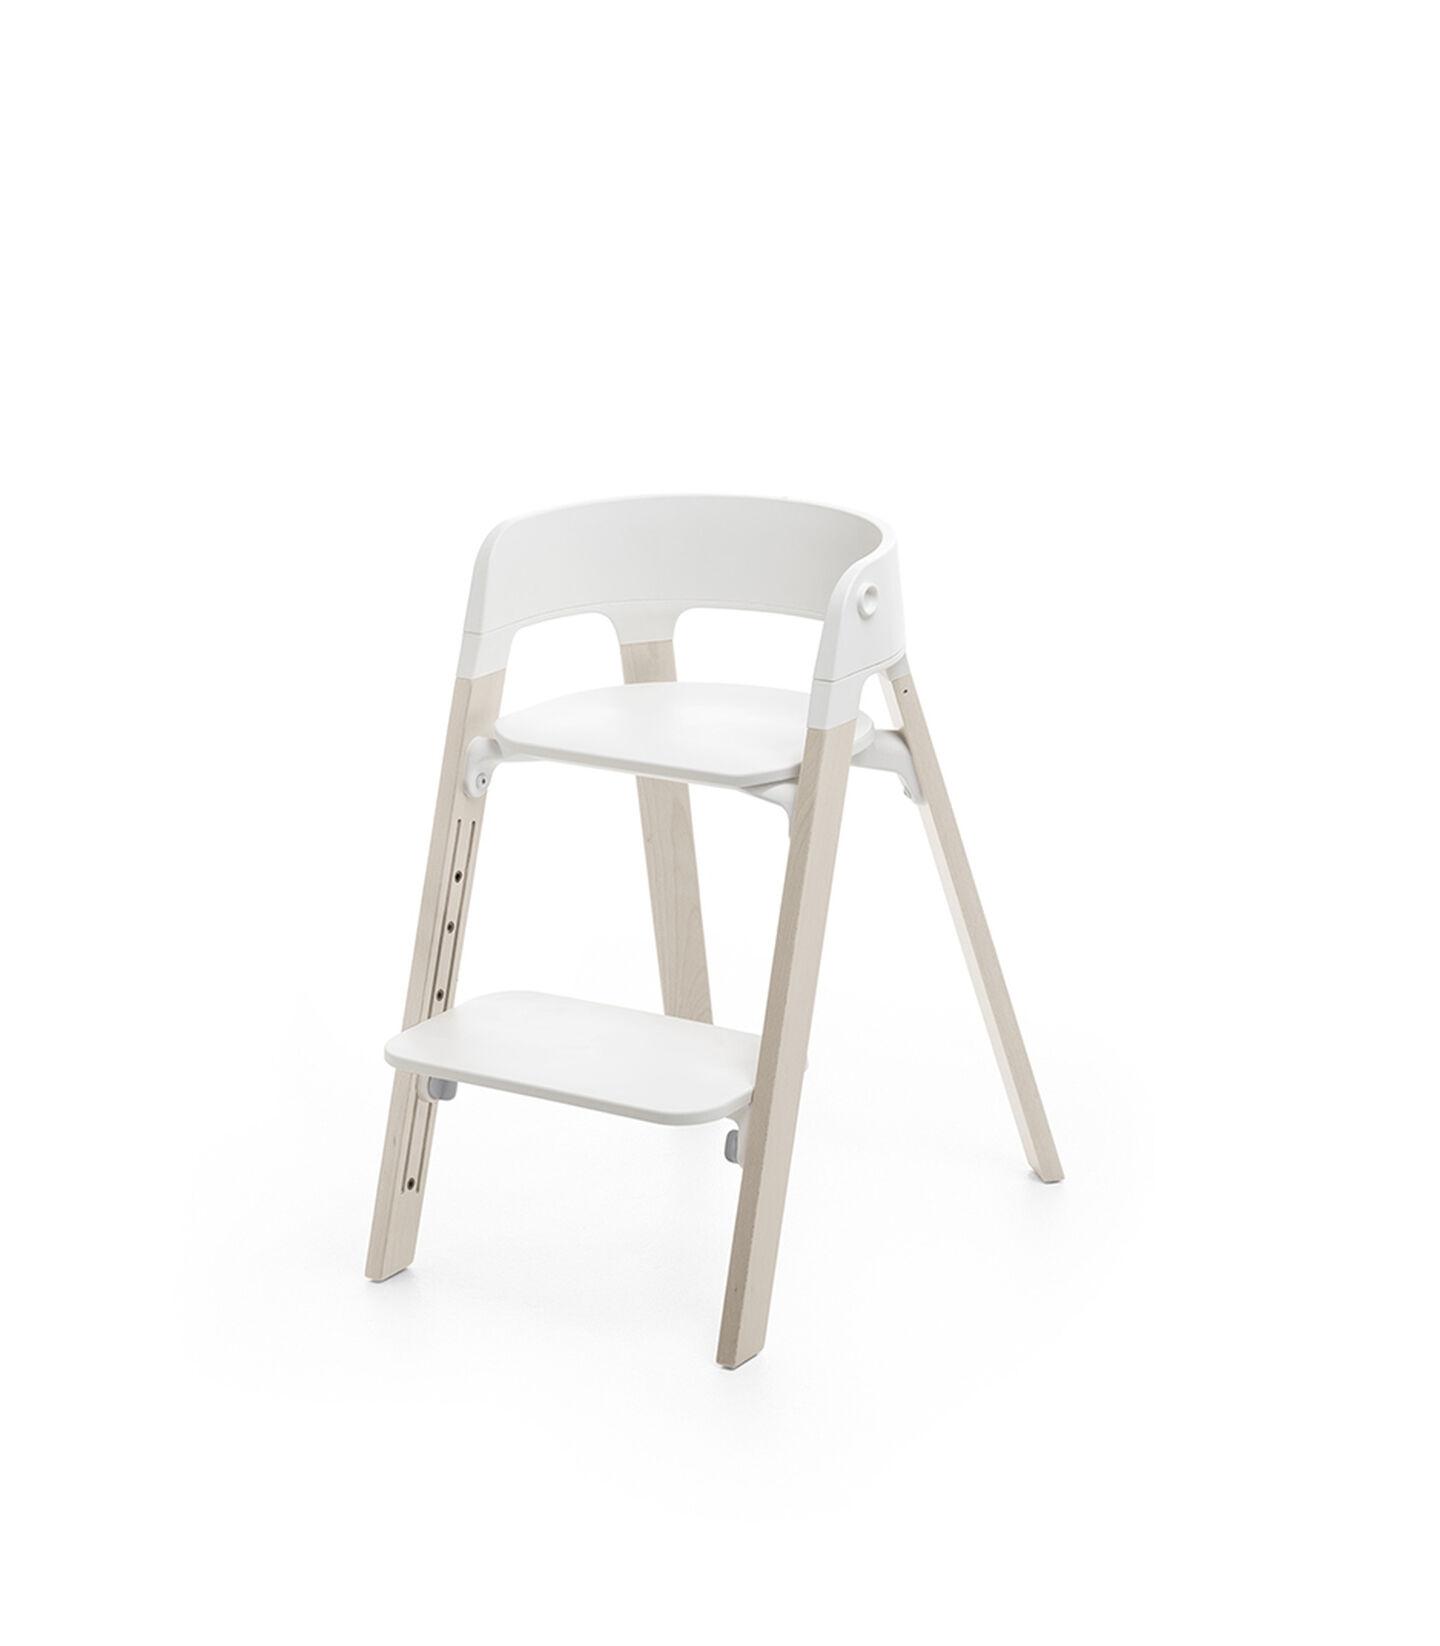 Stokke Steps Chair White Seat Whitewash Legs